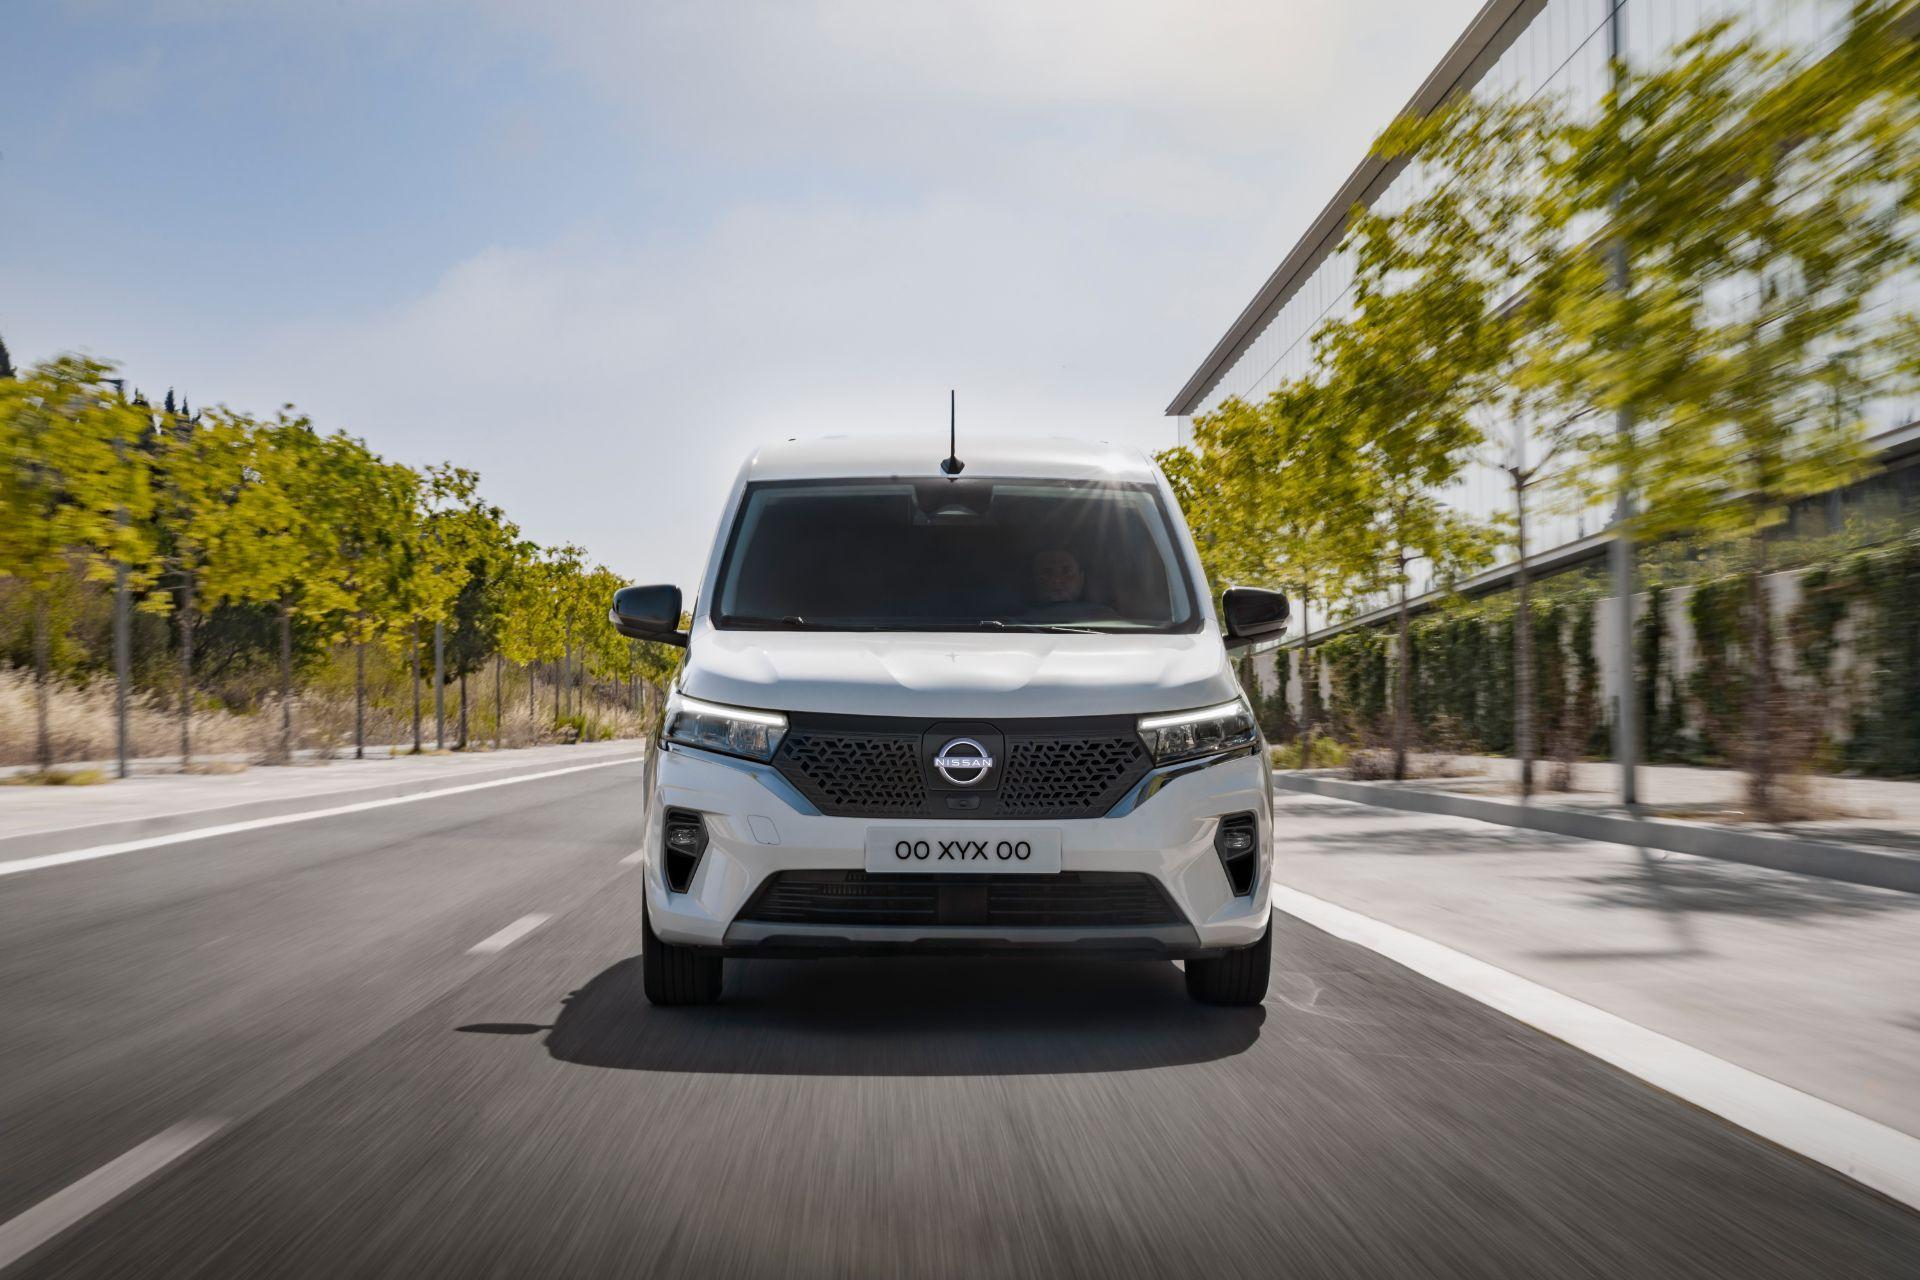 2022-Nissan-Townstar-EV-van-dynamic-1